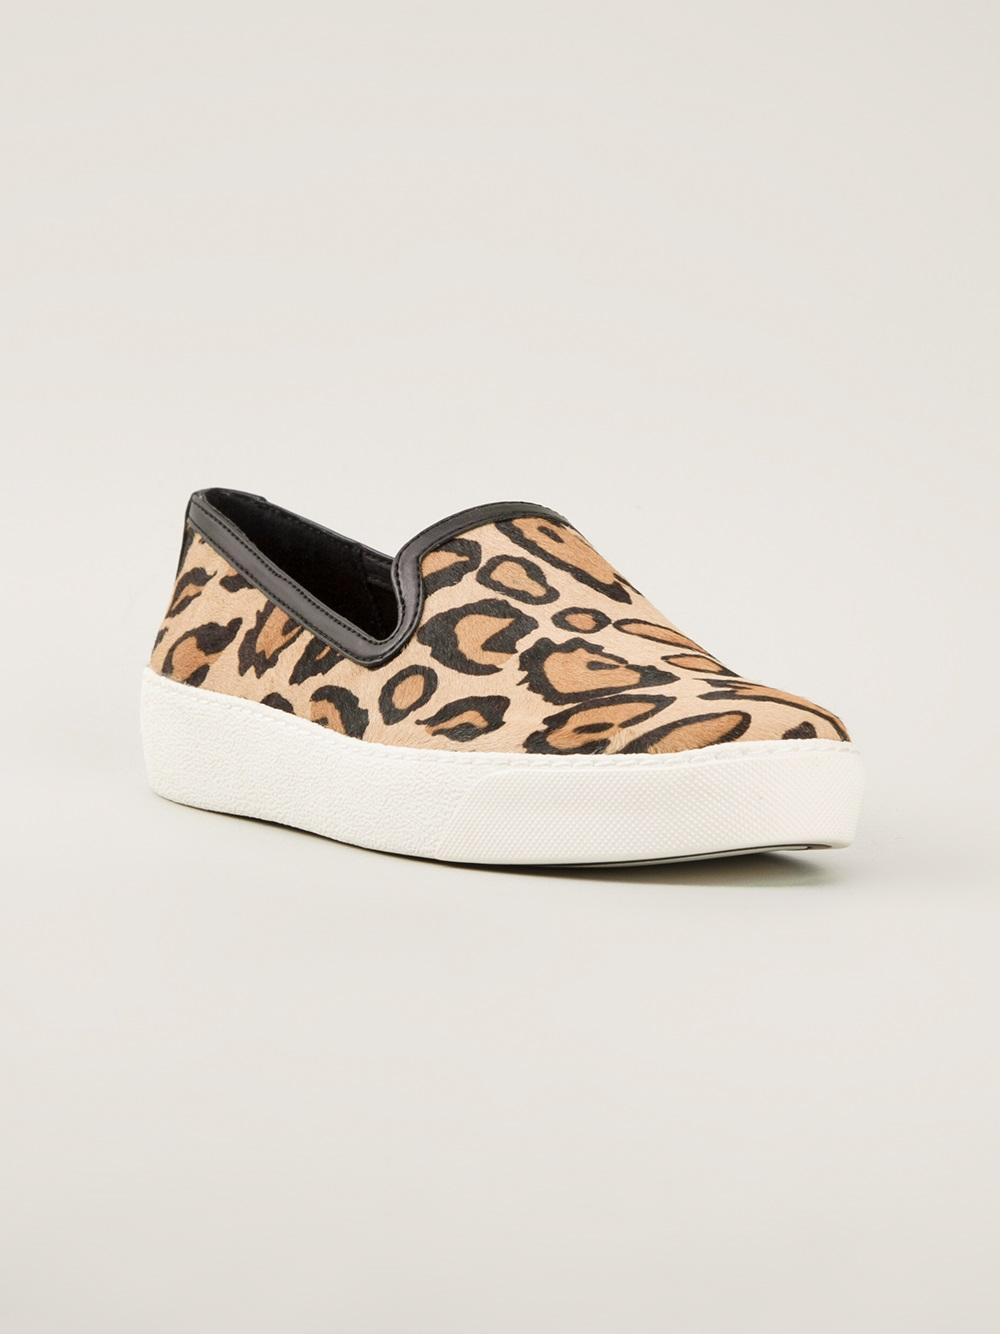 53b9835241bed Lyst - Sam Edelman Leopard Print Sneaker